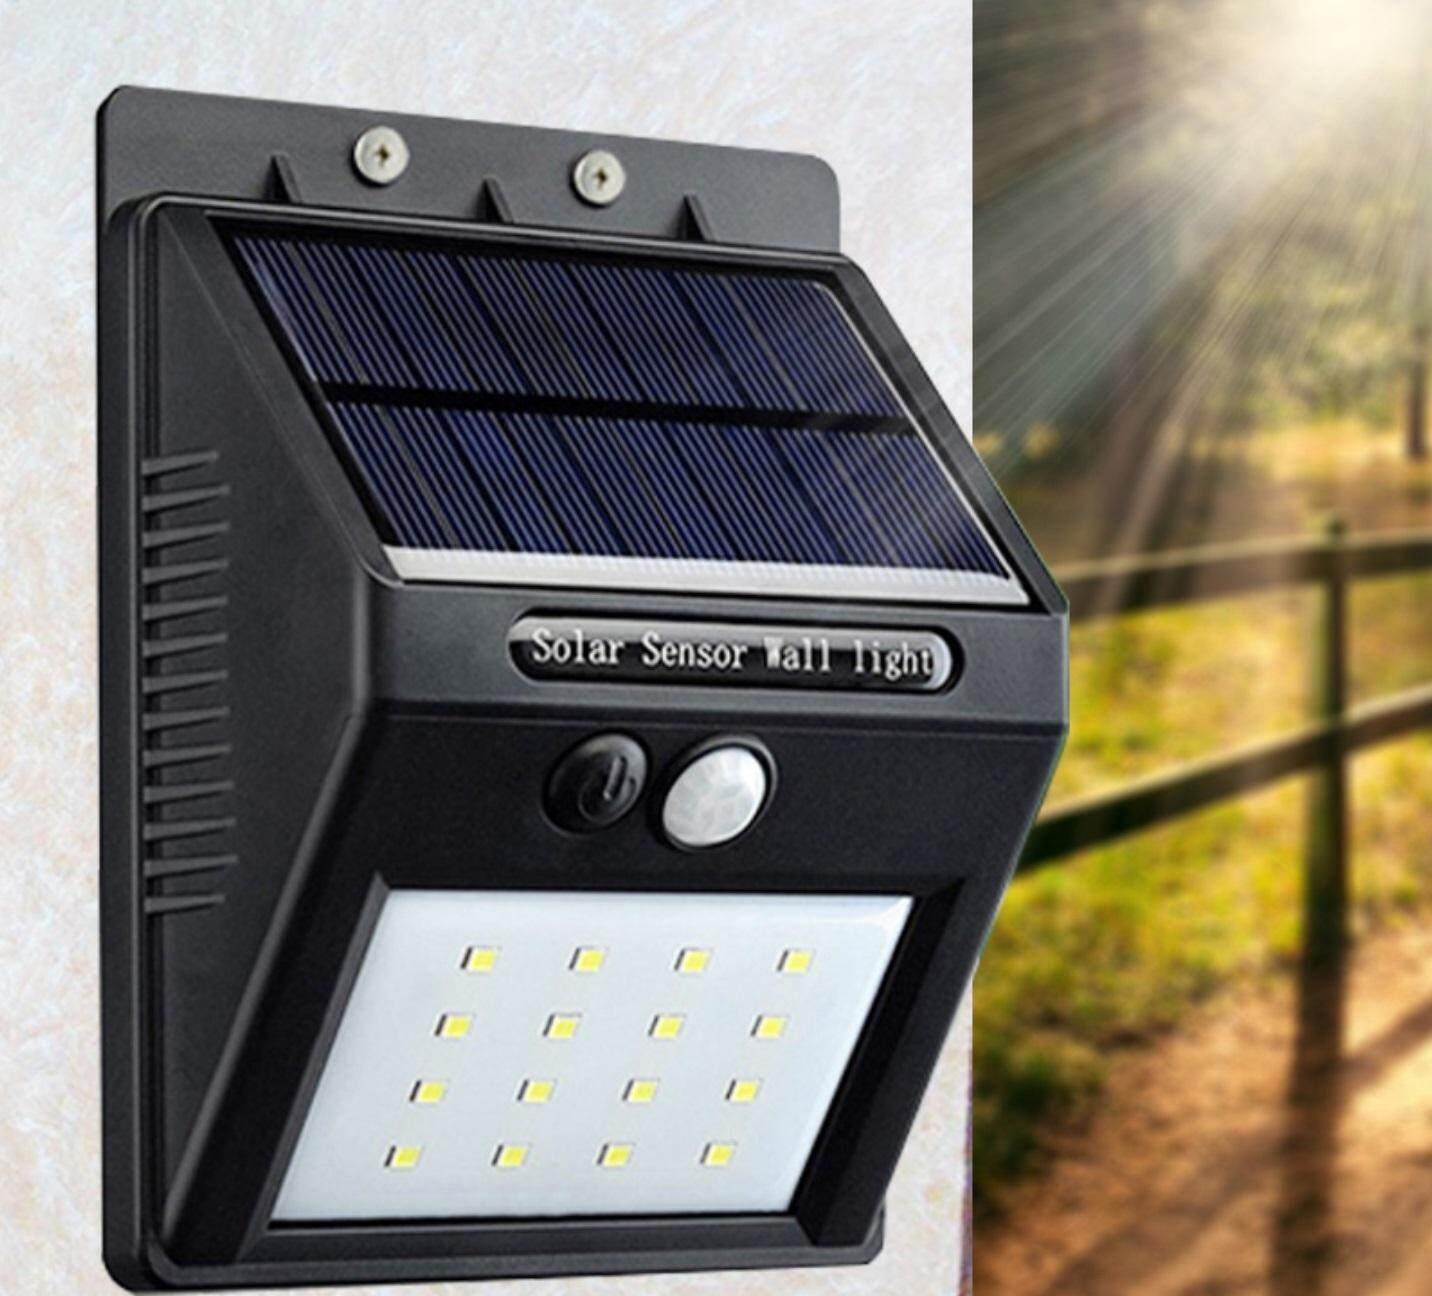 Alumixs อะลูมิกซ์ ไฟติดผนังโซล่าเซลล์พลังงานแสงอาทิตย์ รุ่น 20 Led.